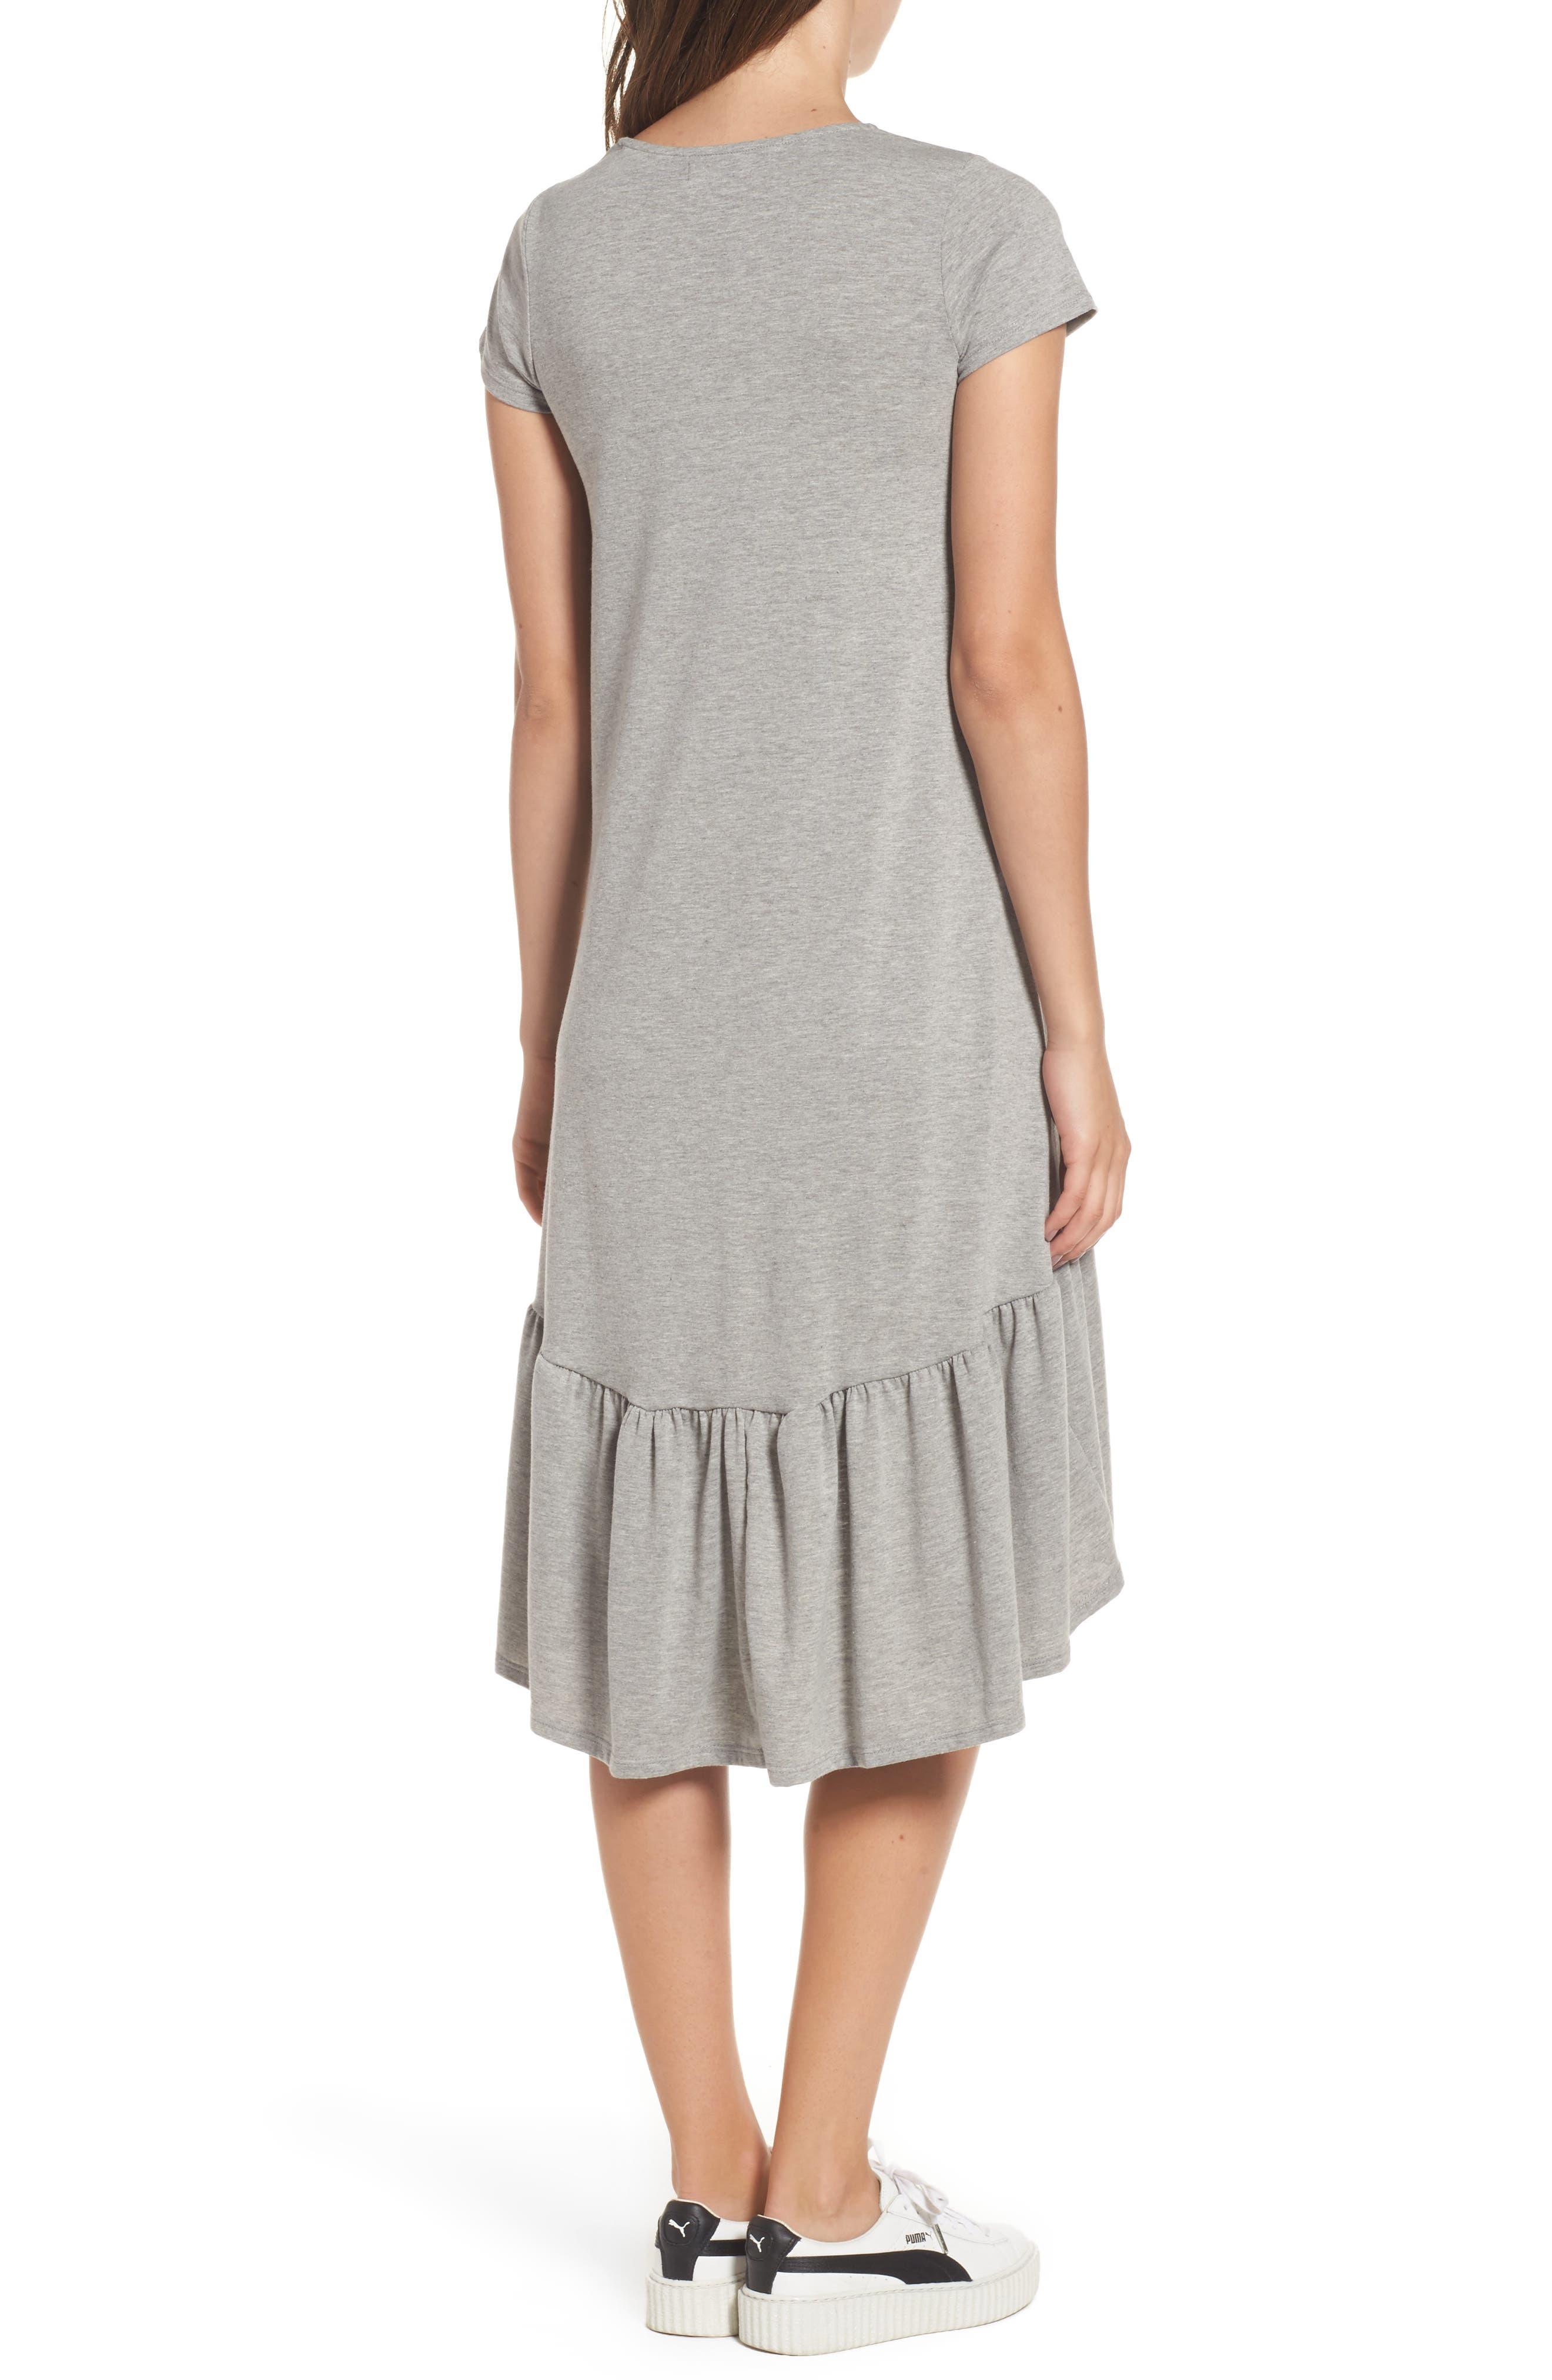 Alternate Image 2  - Cotton Emporium Ruffle Hem Knit T-Shirt Dress